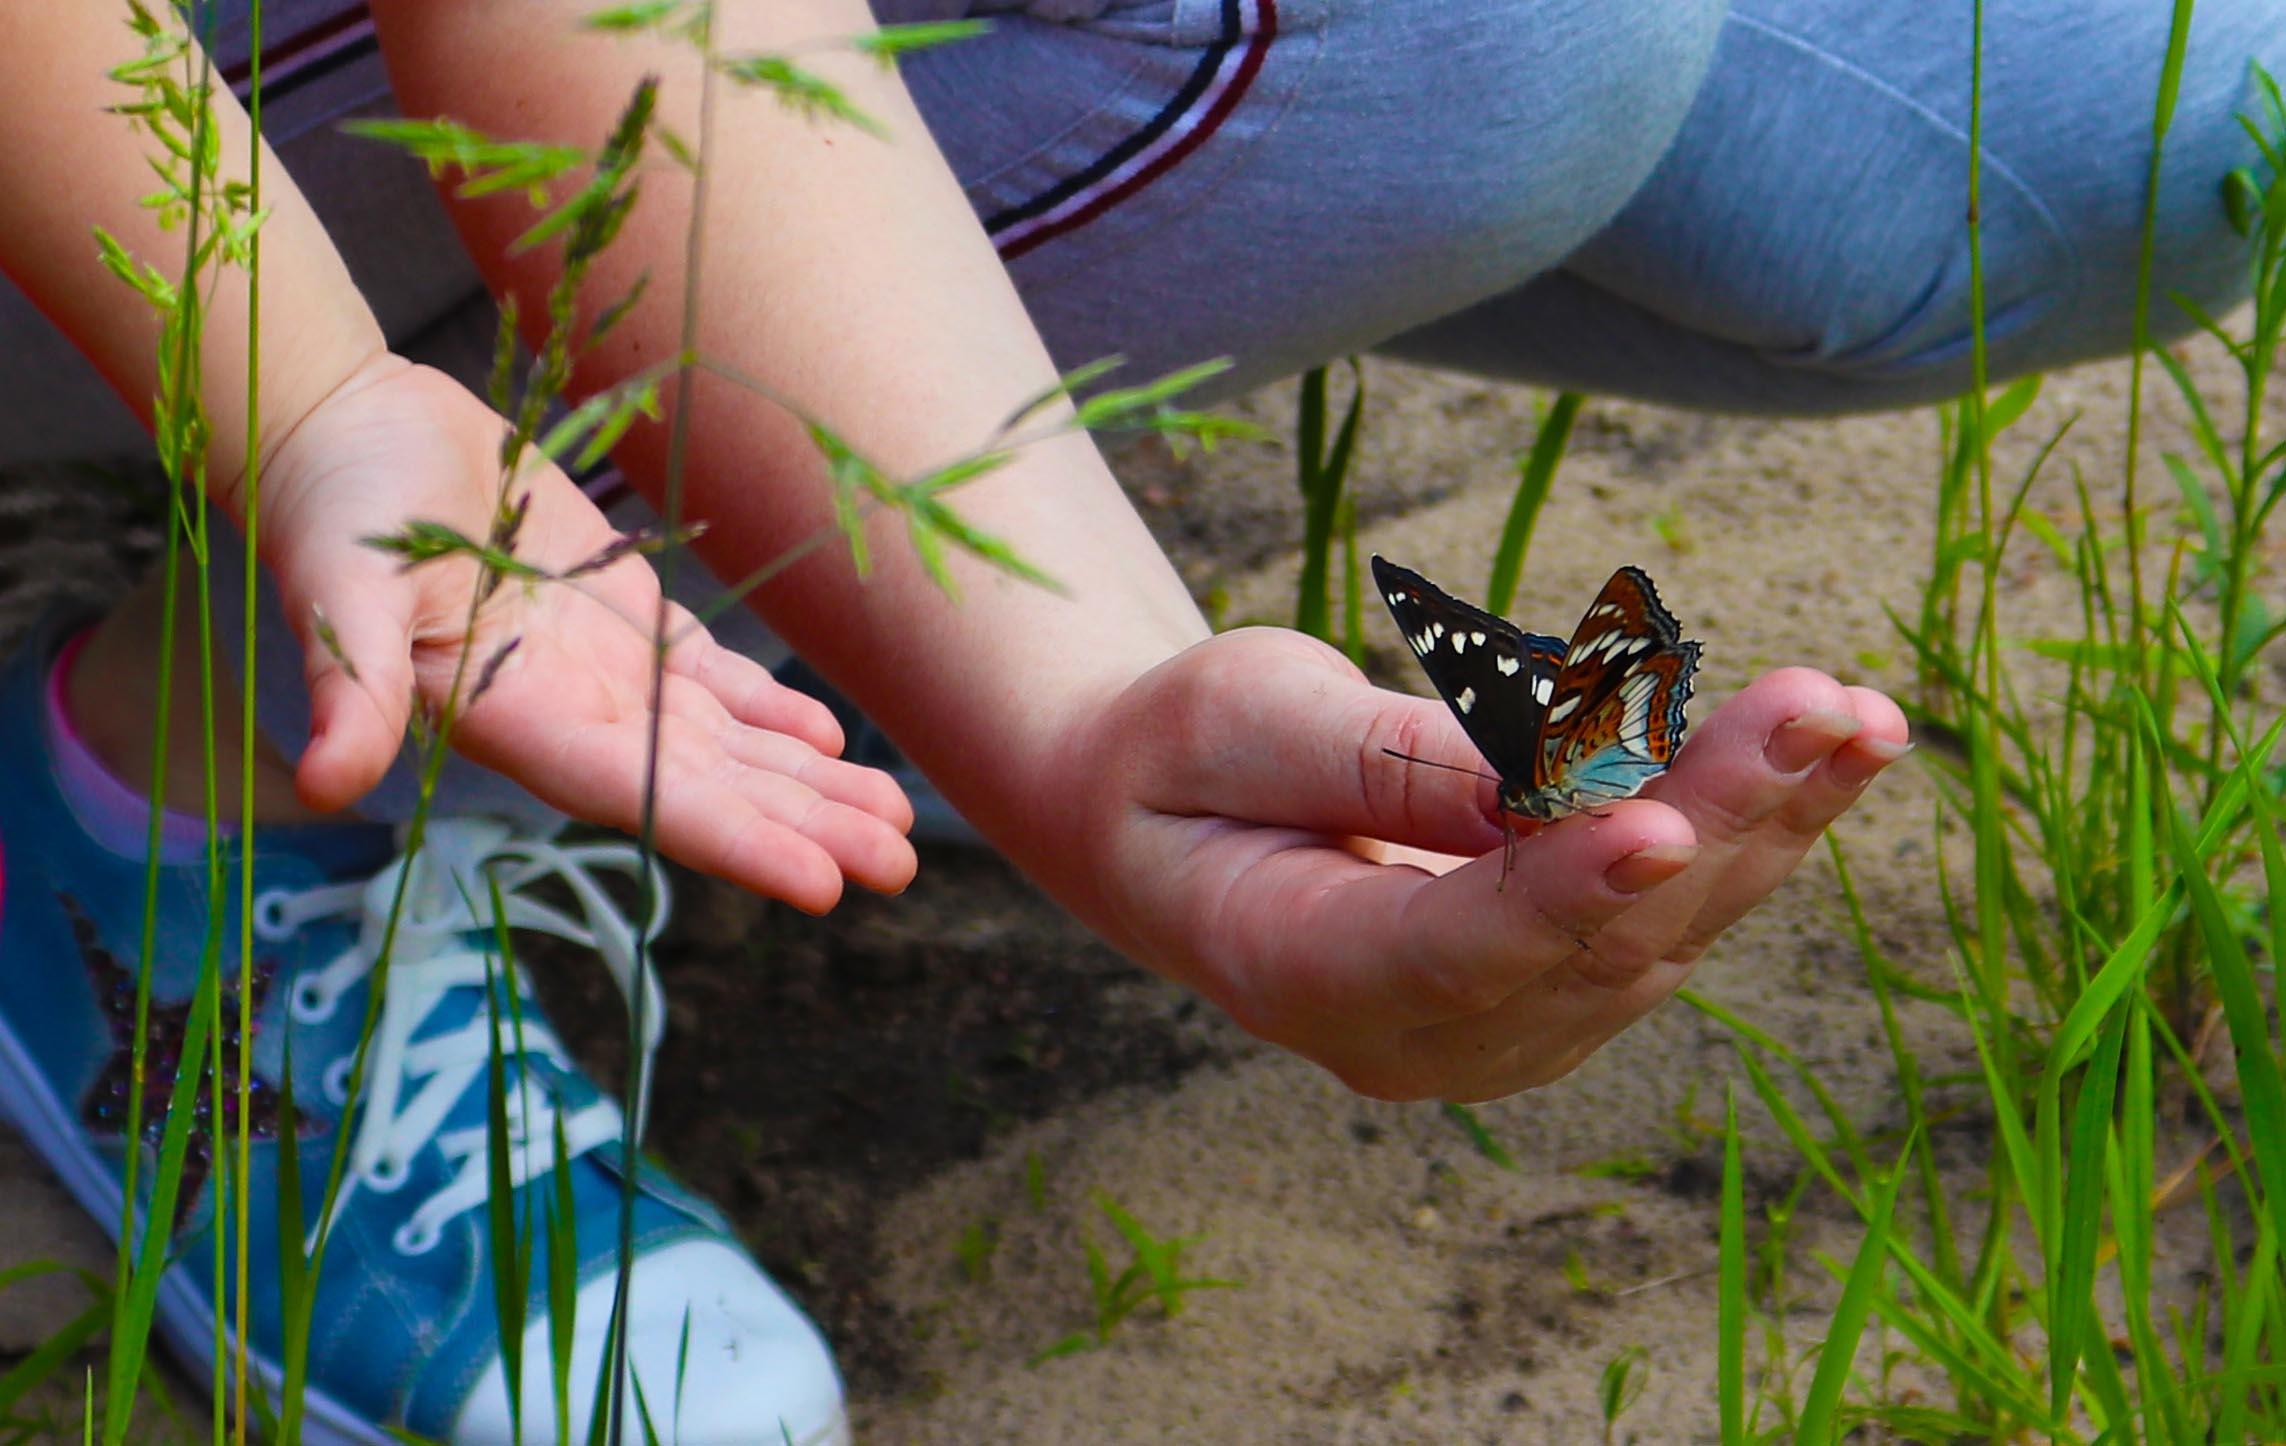 Некоторые бабочки даже доверчиво садились на руку